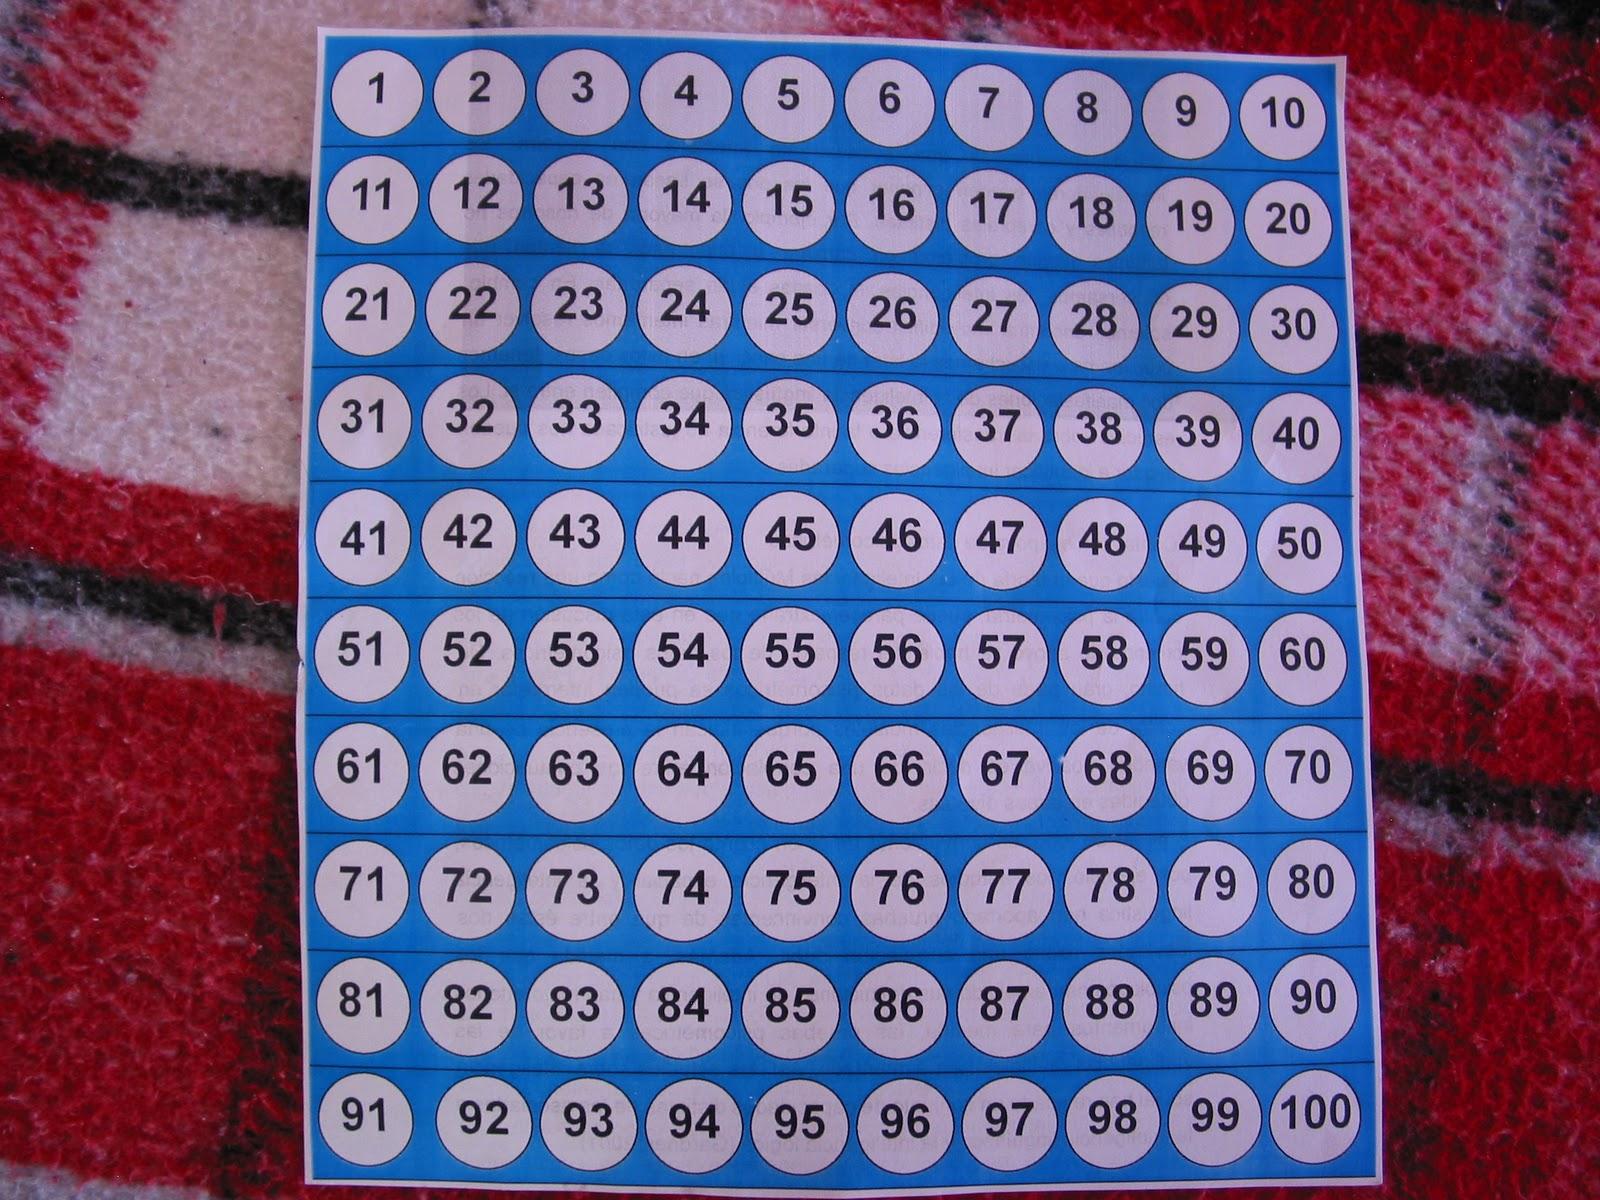 100 bases de tapas de leche pegadas sobre una madera de 40 x 40cm